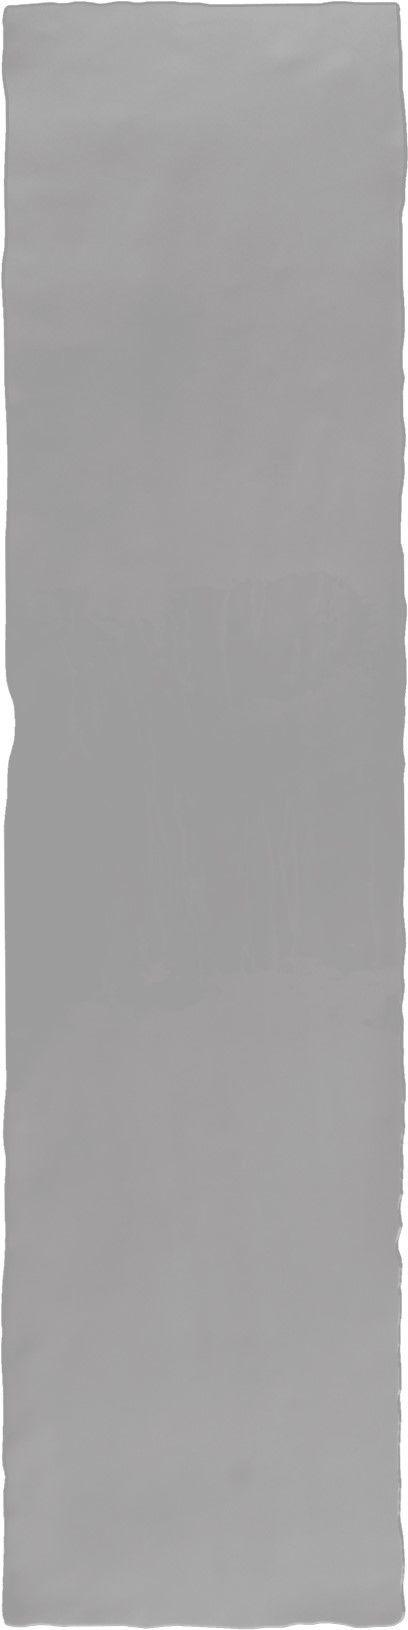 WOW design Handmade Floor Greige 6,8x27,8 cegła